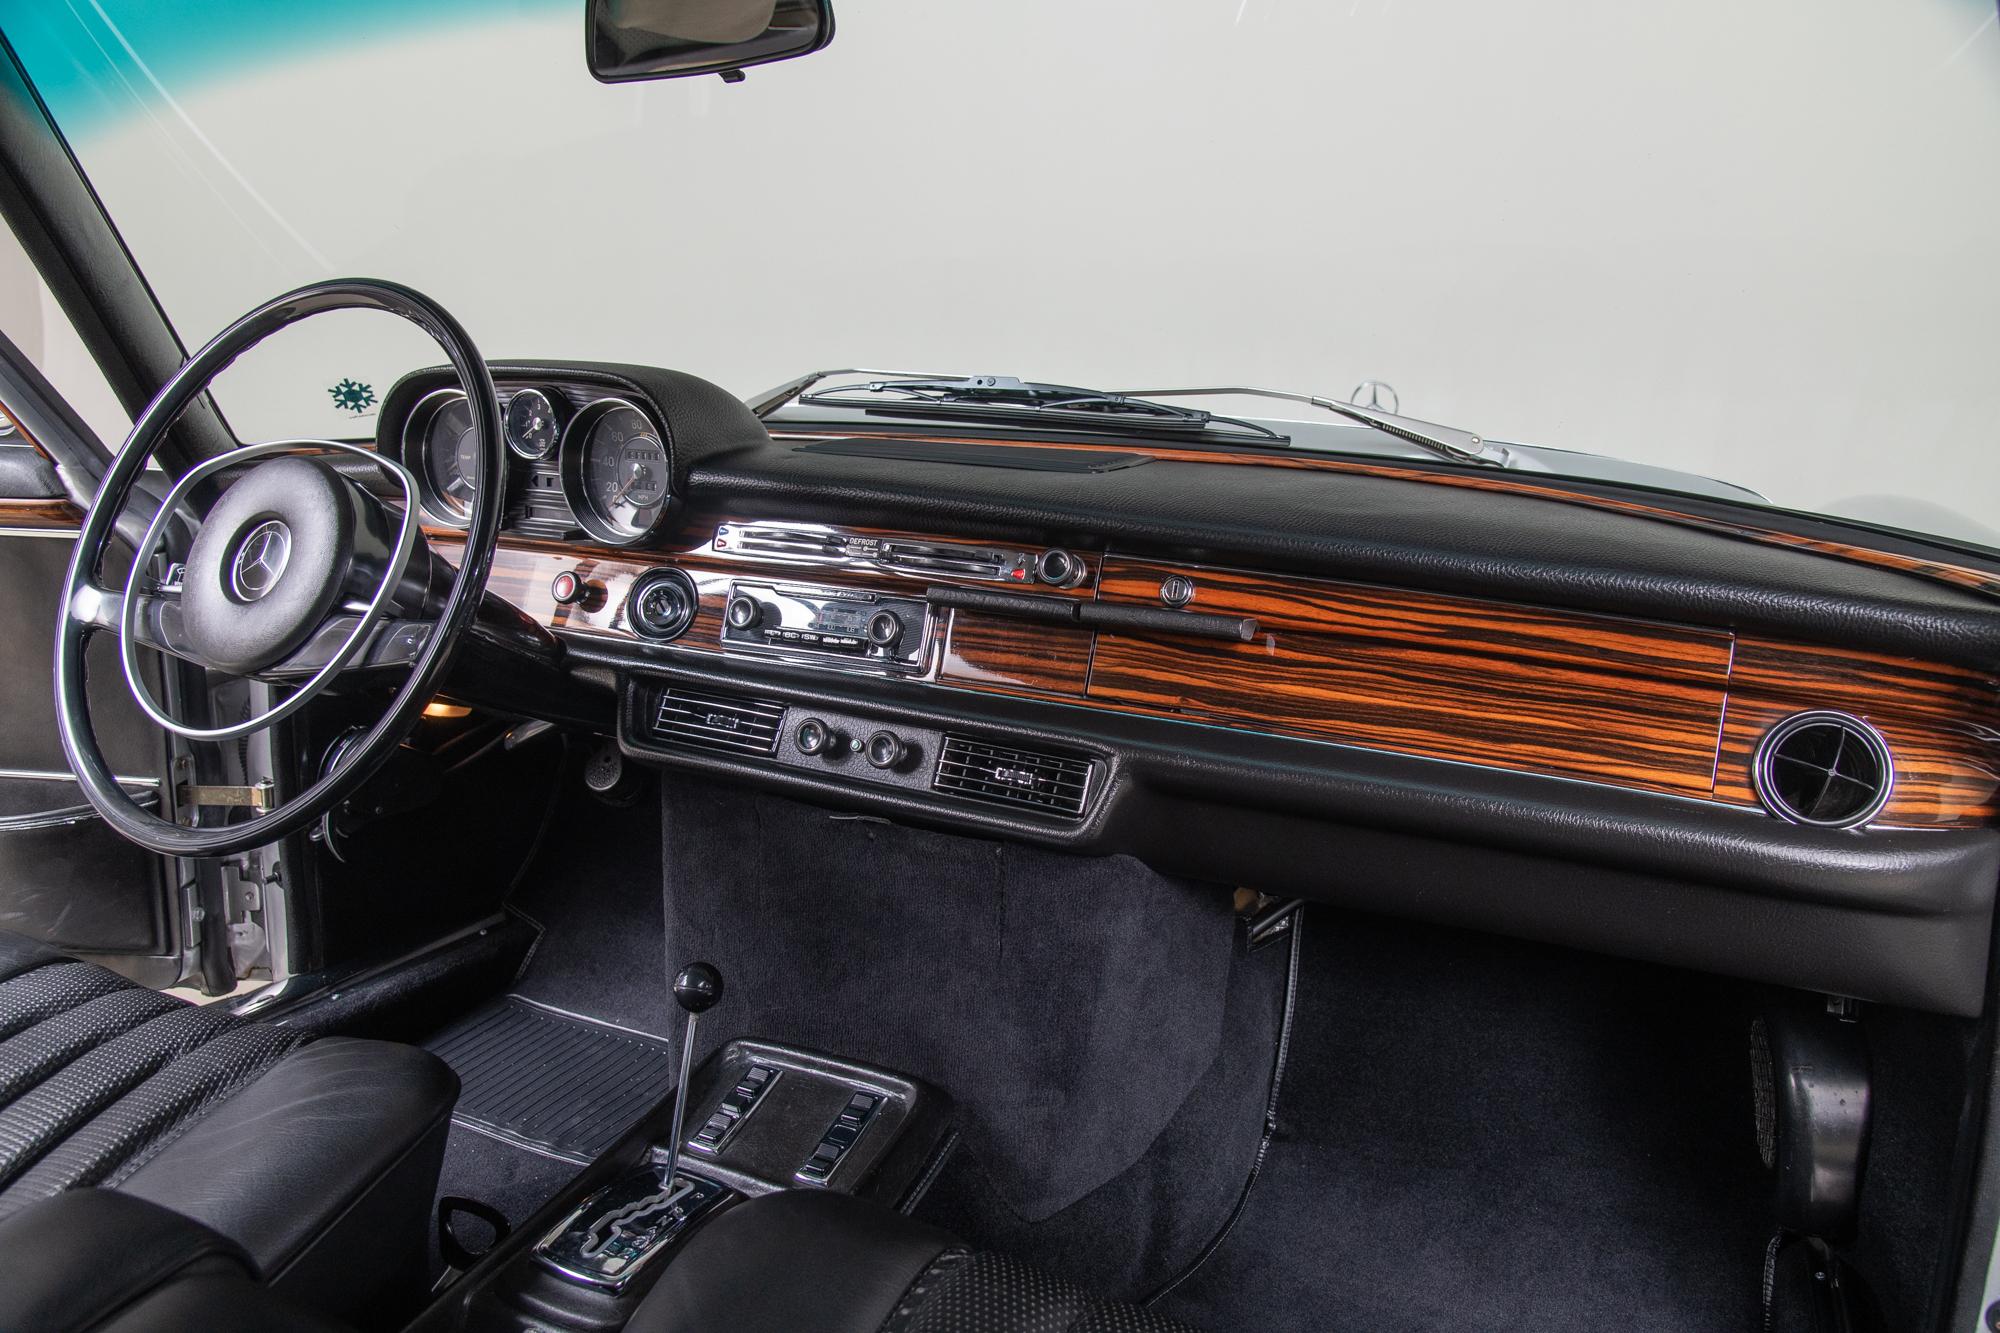 1969 Mercedes-Benz 300 SEL 6.3 , SILVER, VIN 109.018-12-002441, MILEAGE 7659